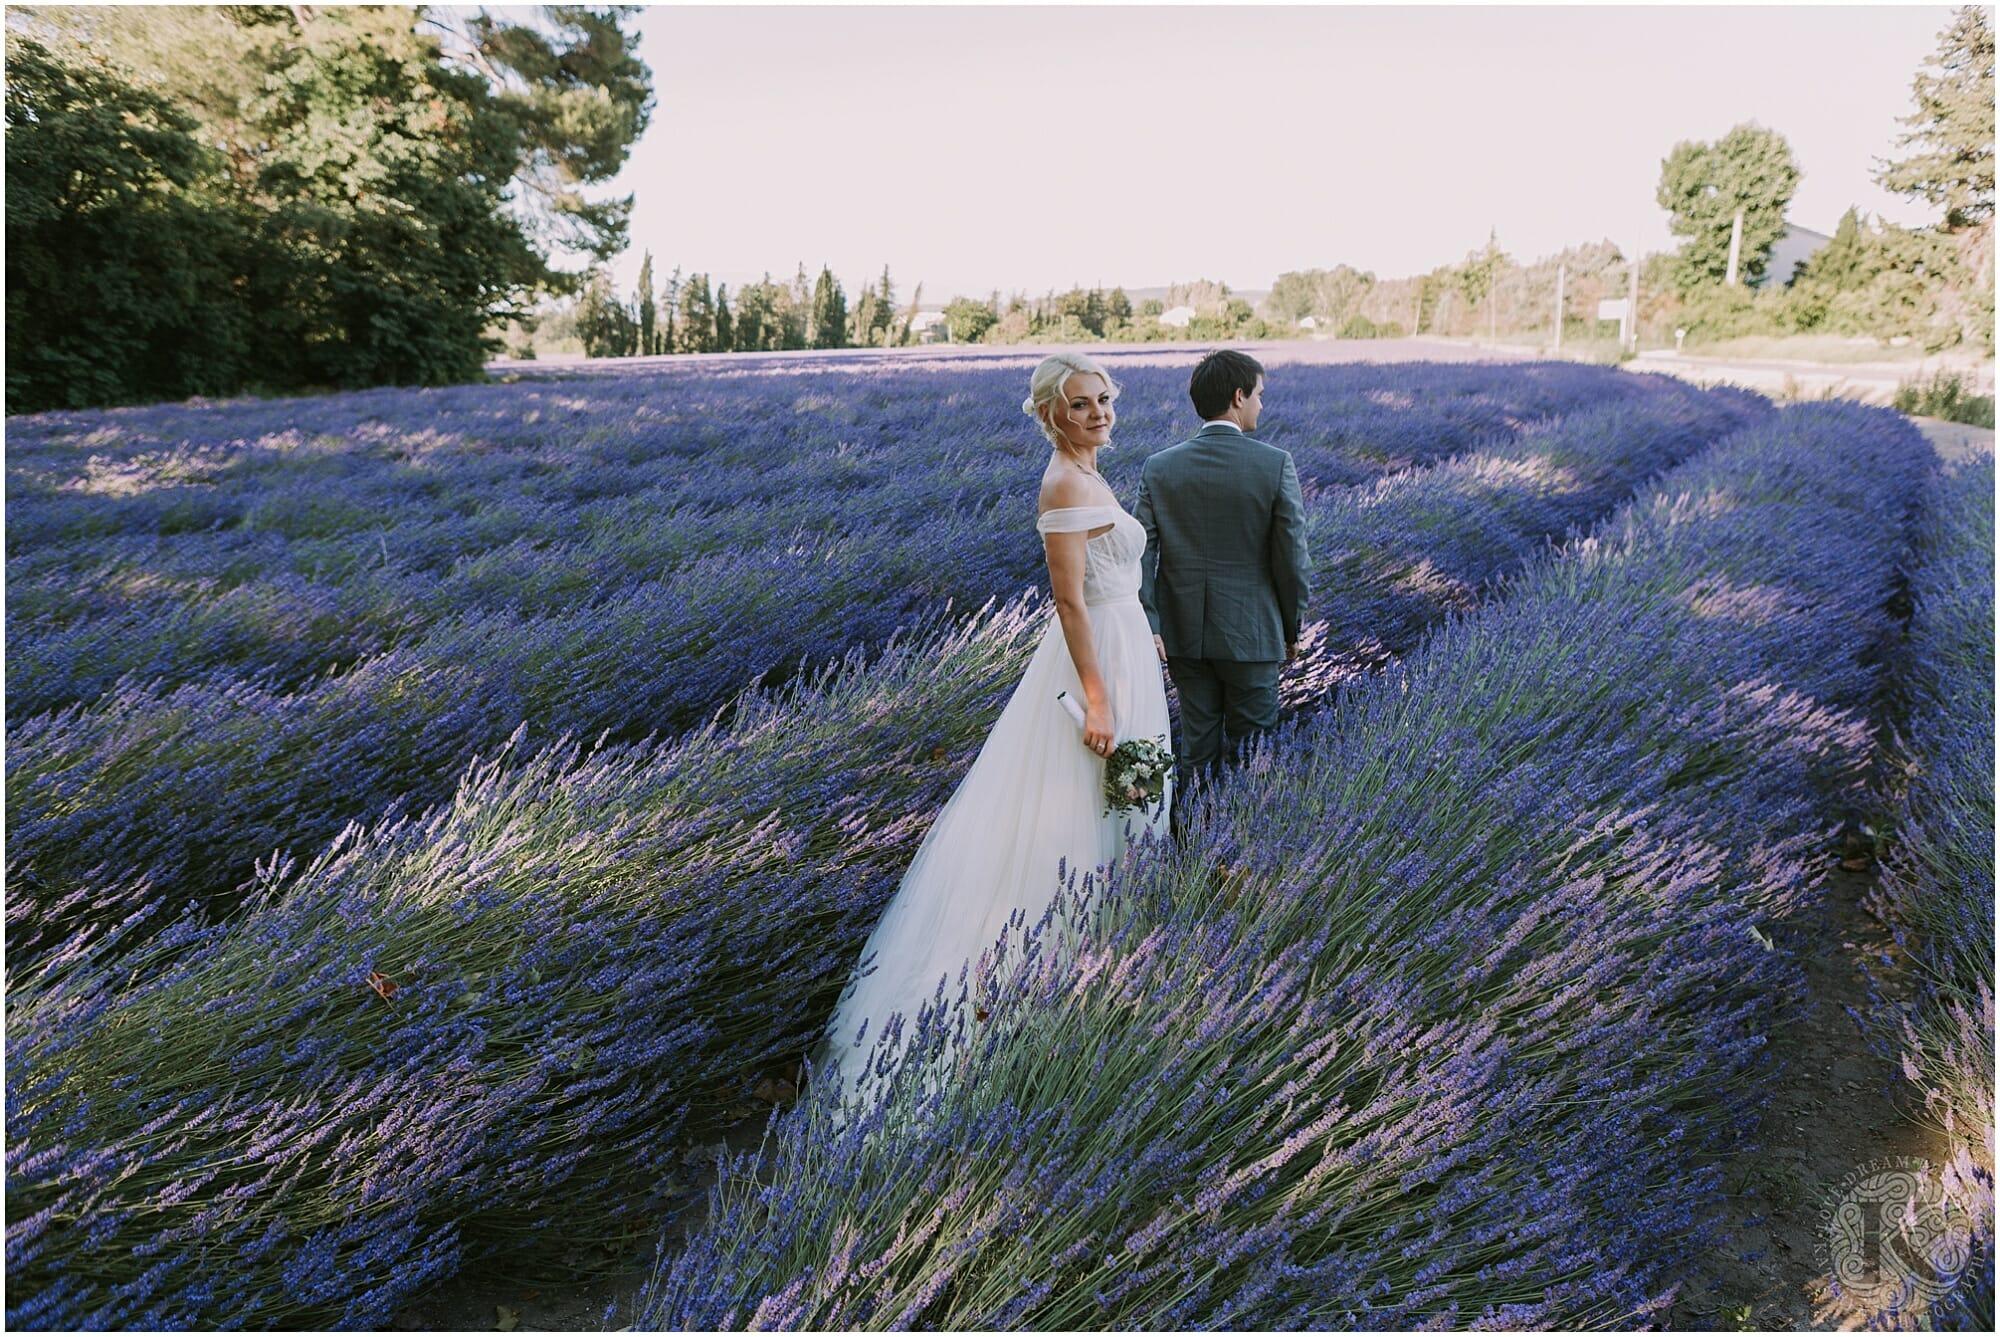 Kateryna-photos-photographe-mariage-chateau-des-3-fontaines-provence-avignon-vaucluse-sud_0091.jpg